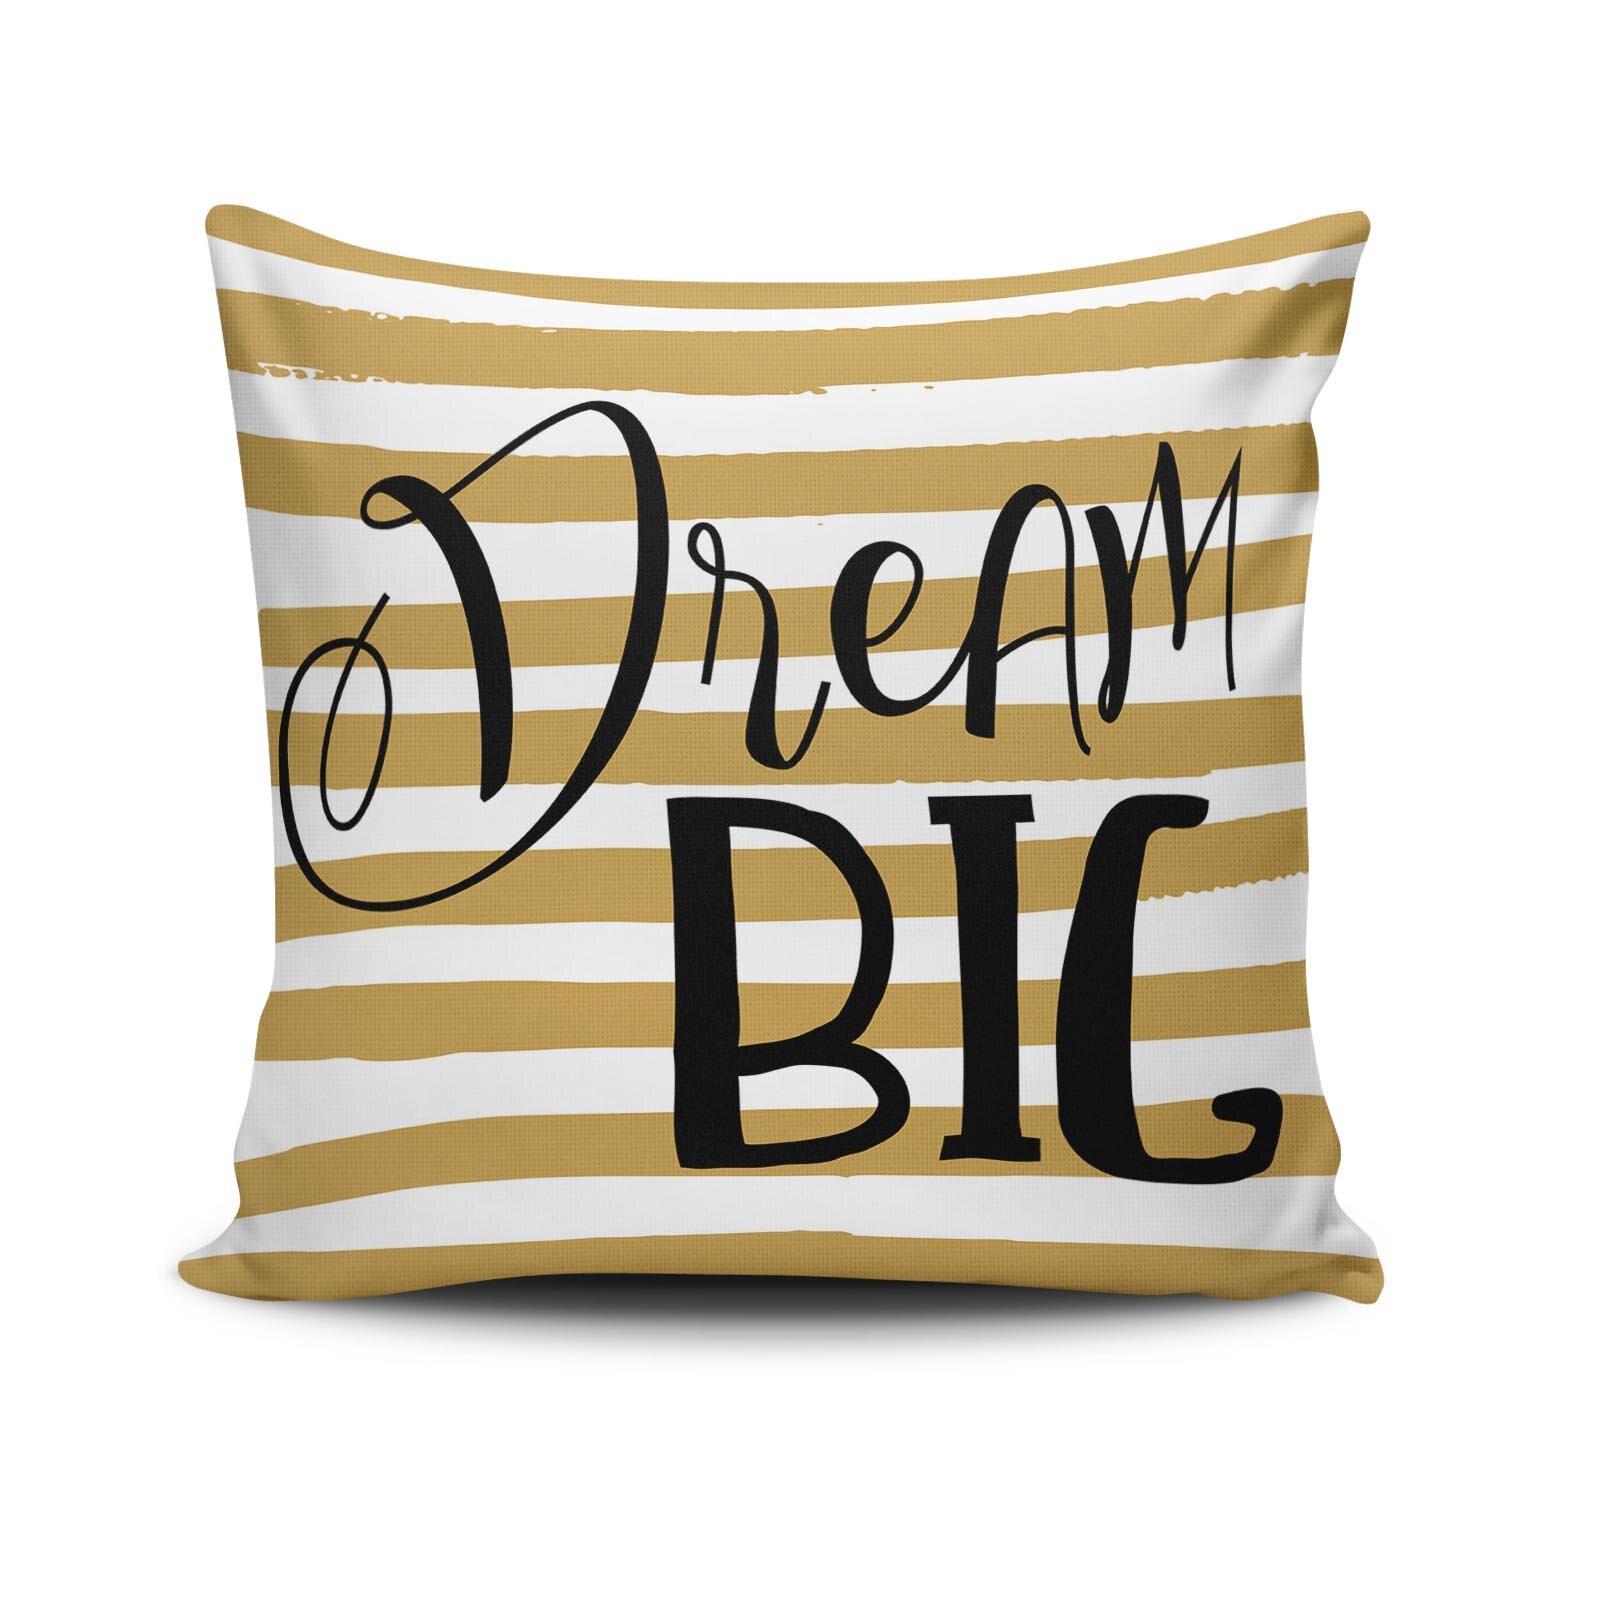 Perna decorativa Cushion Love, Dimensiune: 45 x 45 cm, Material exterior: 50% bumbac / 50% poliester 768CLV0208